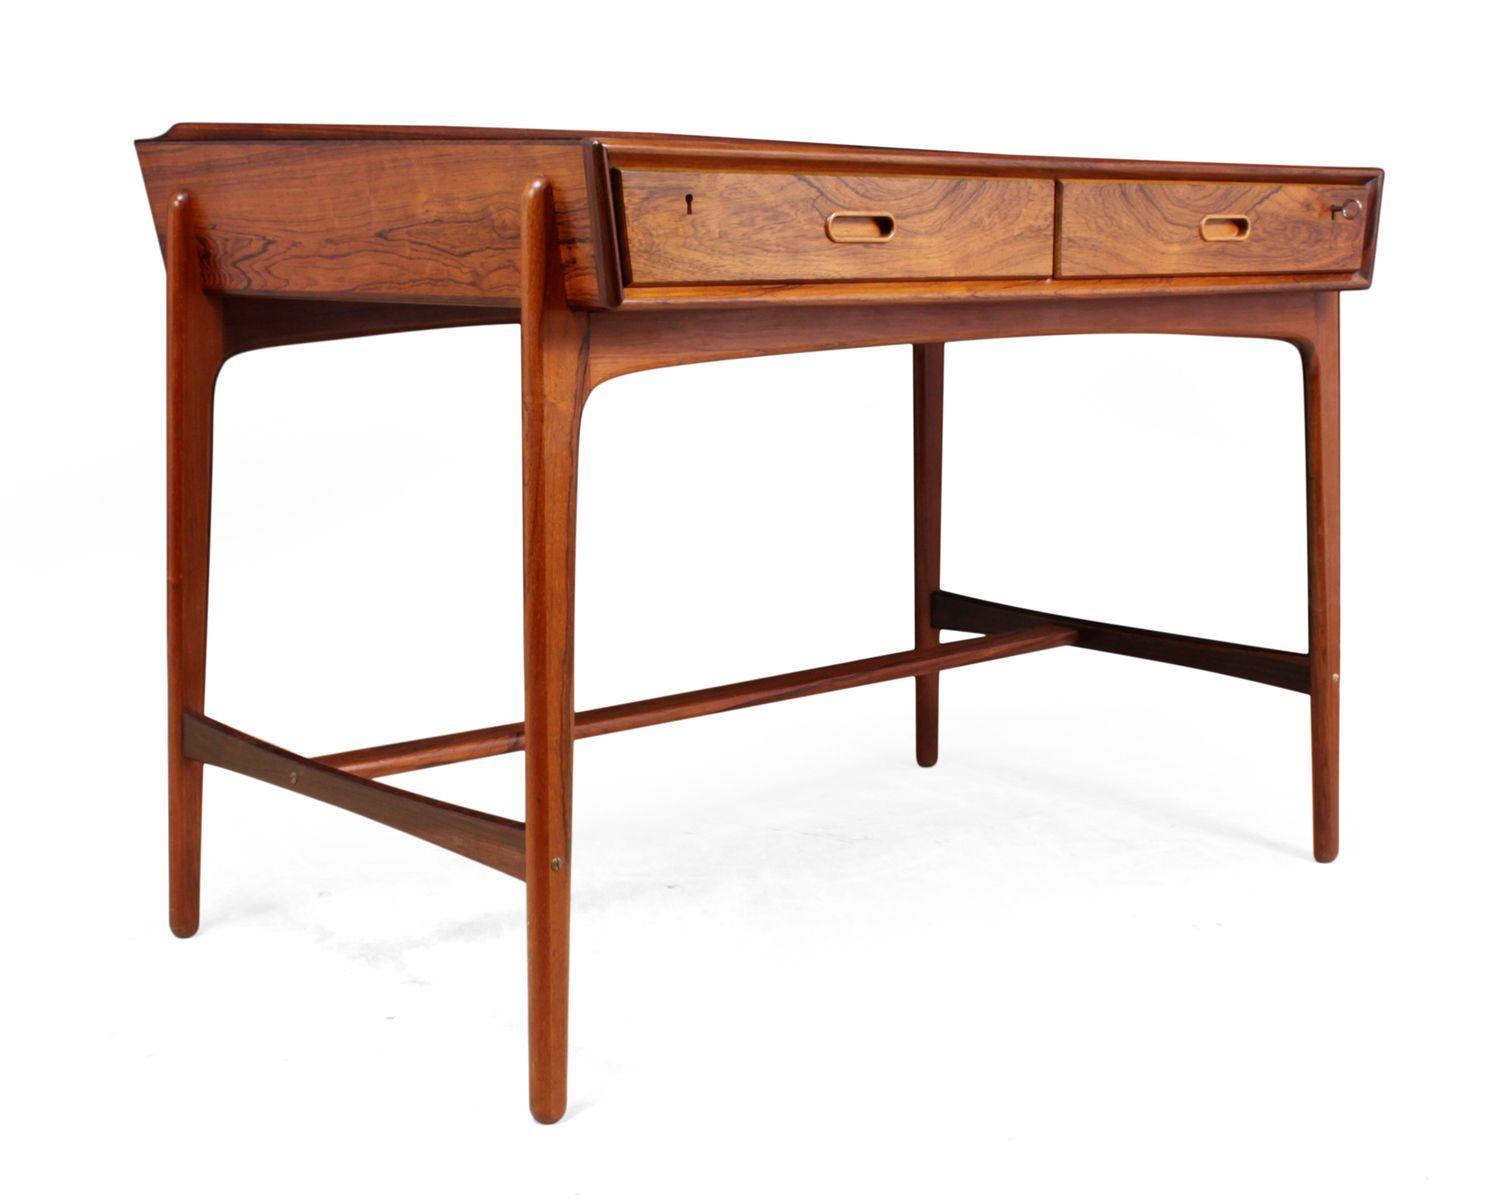 Mid Century Danish Desk By Svend Age Madsen For Sale At Pamono Danish Desk Mid Century Danish Desk Mid Century Desk